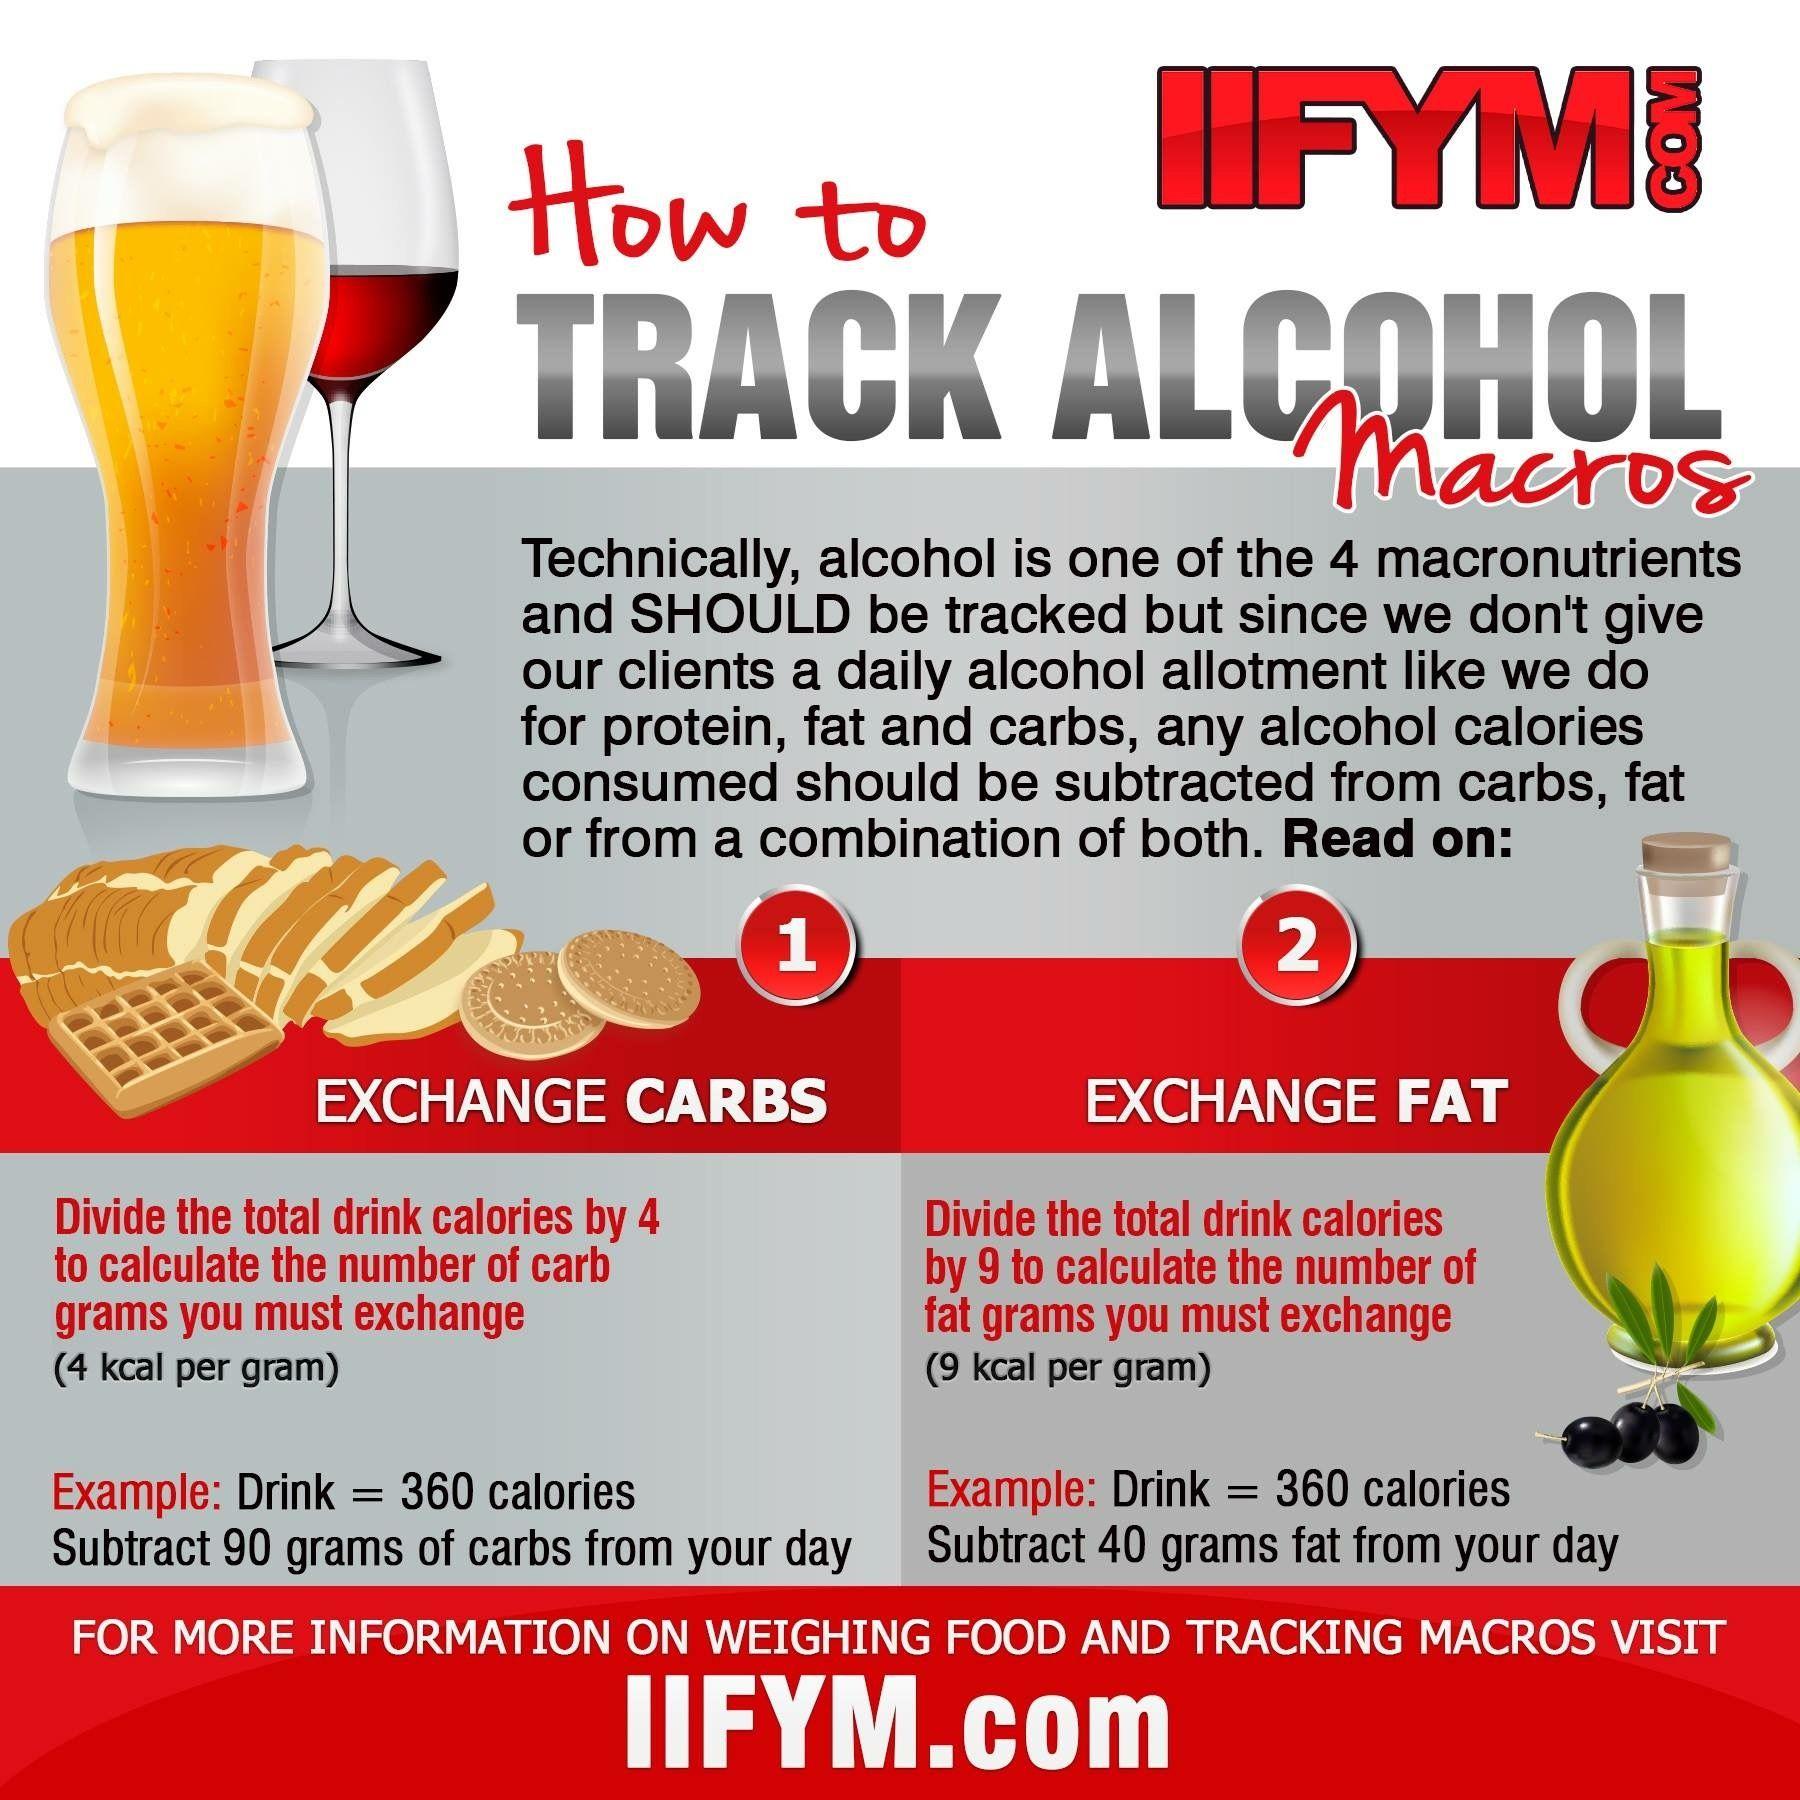 How To Track Alcohol Macros Macros Diet Macros Alcohol Calories